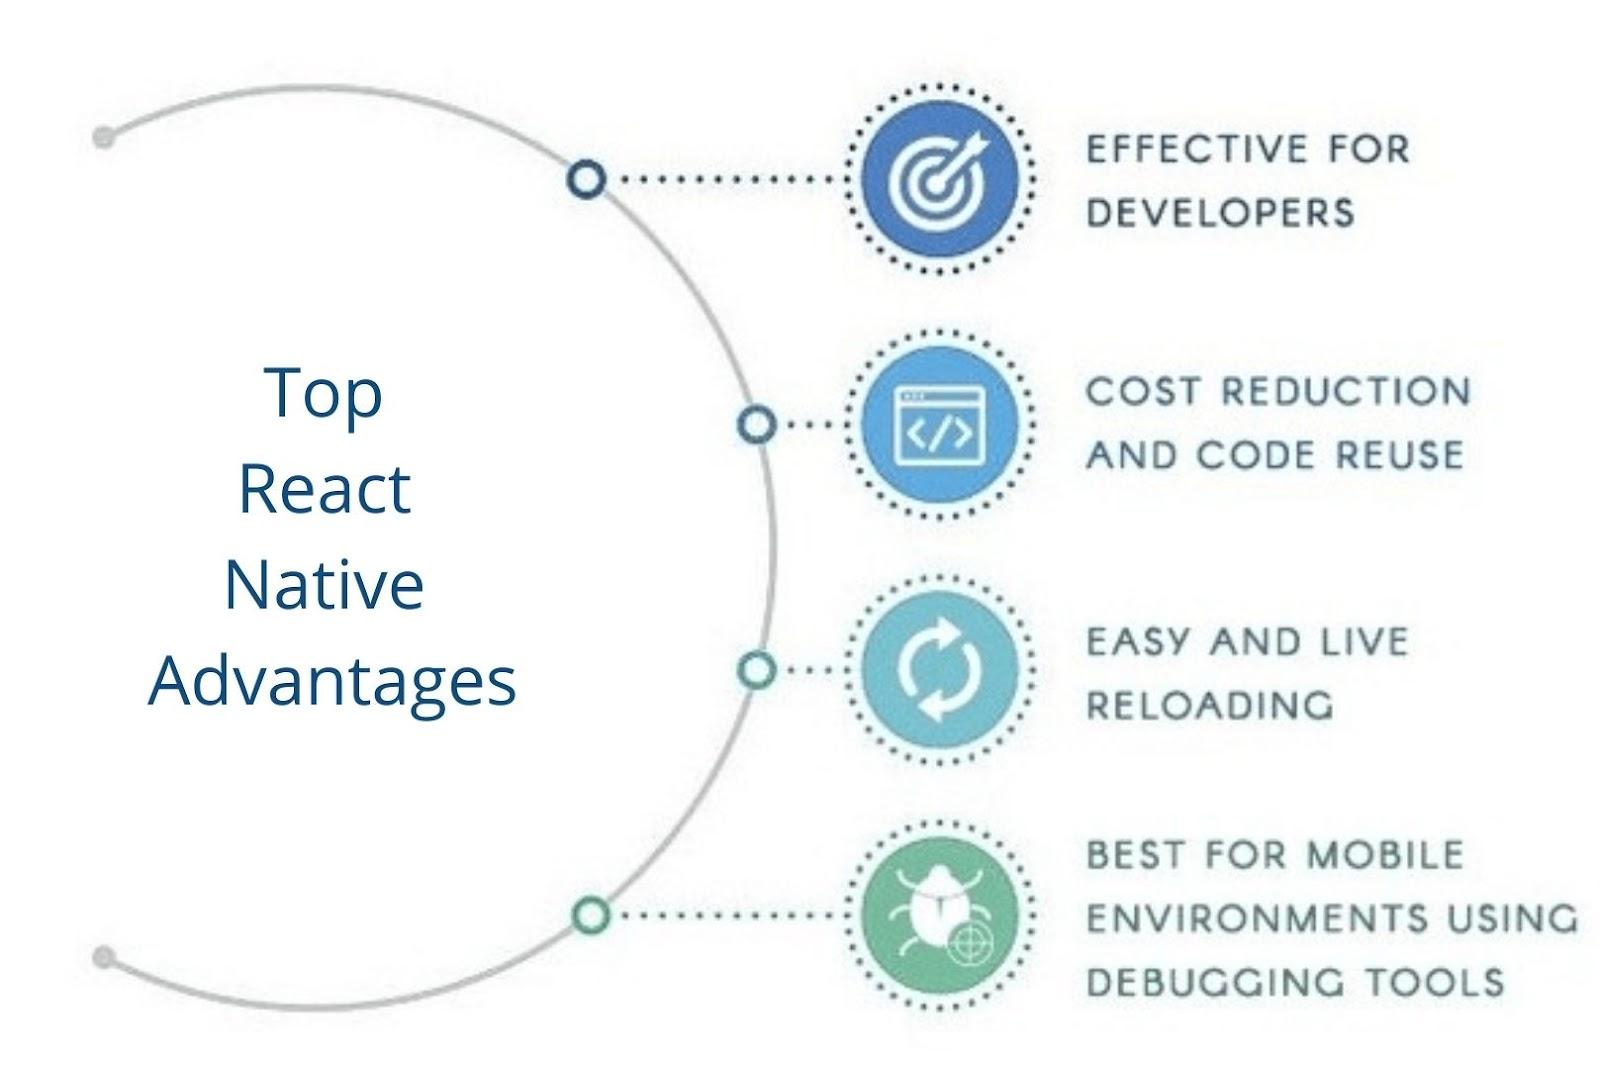 top react native advantages